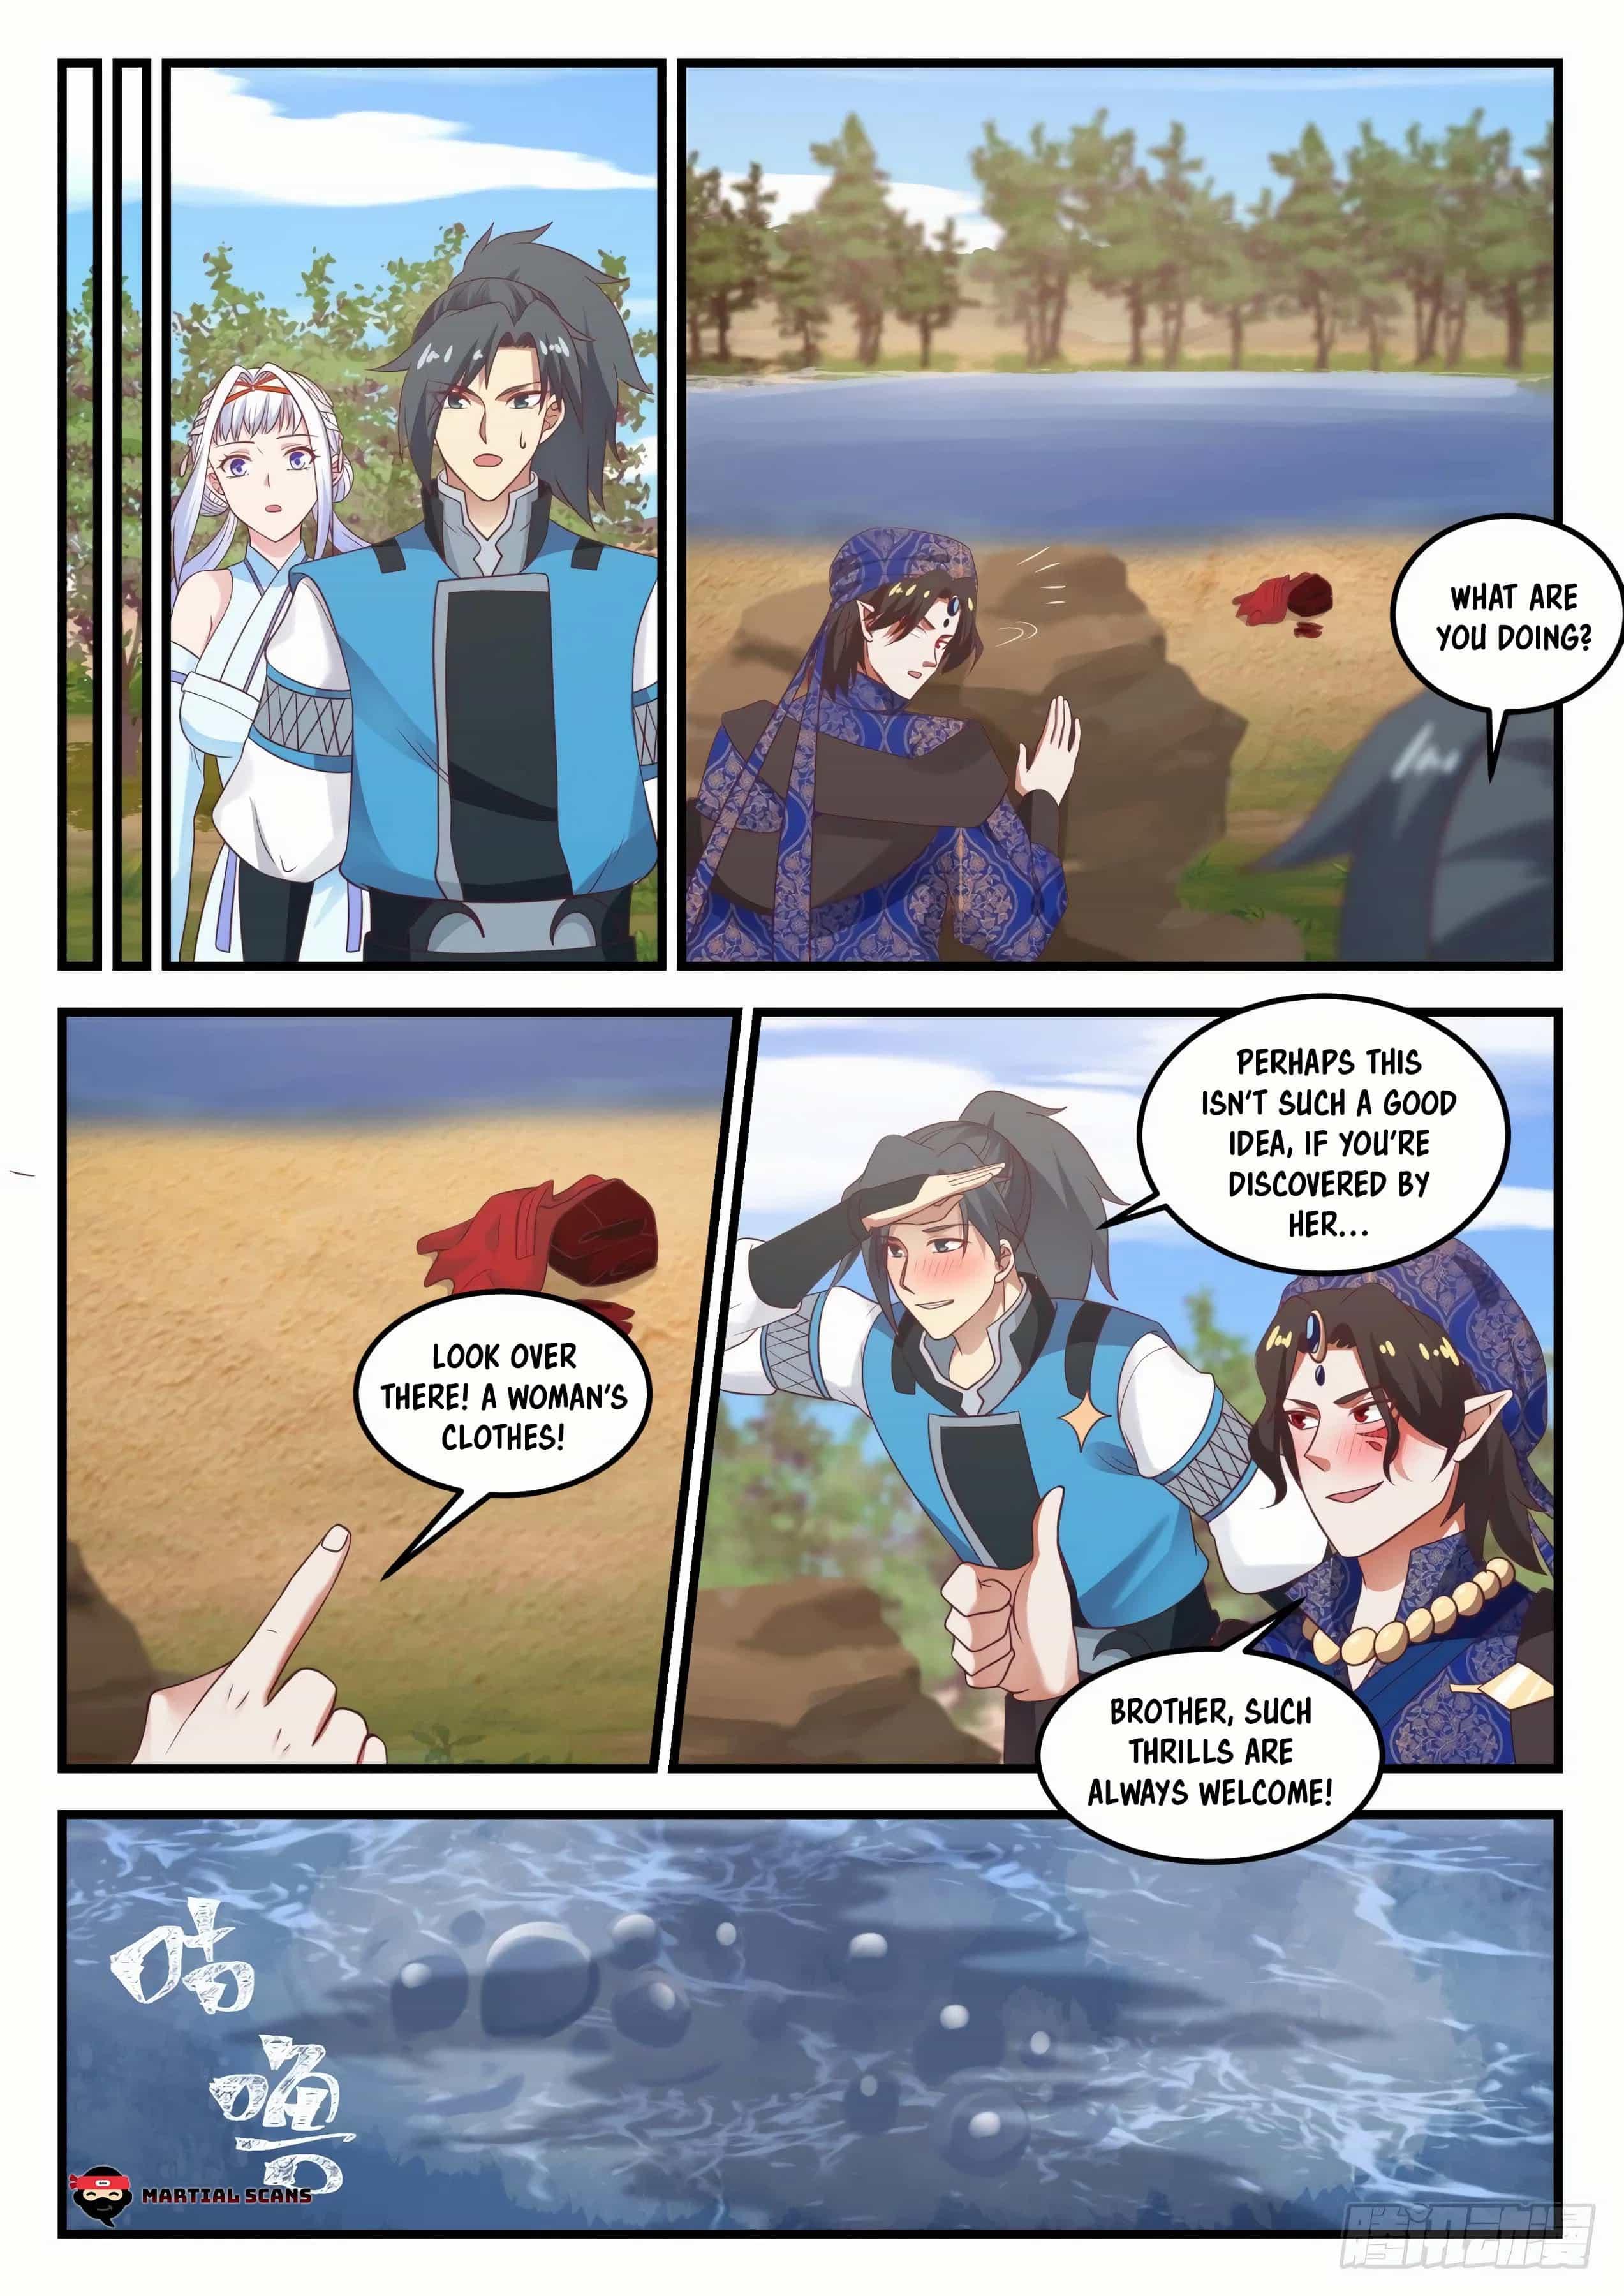 Martial Peak - chapter 714-eng-li